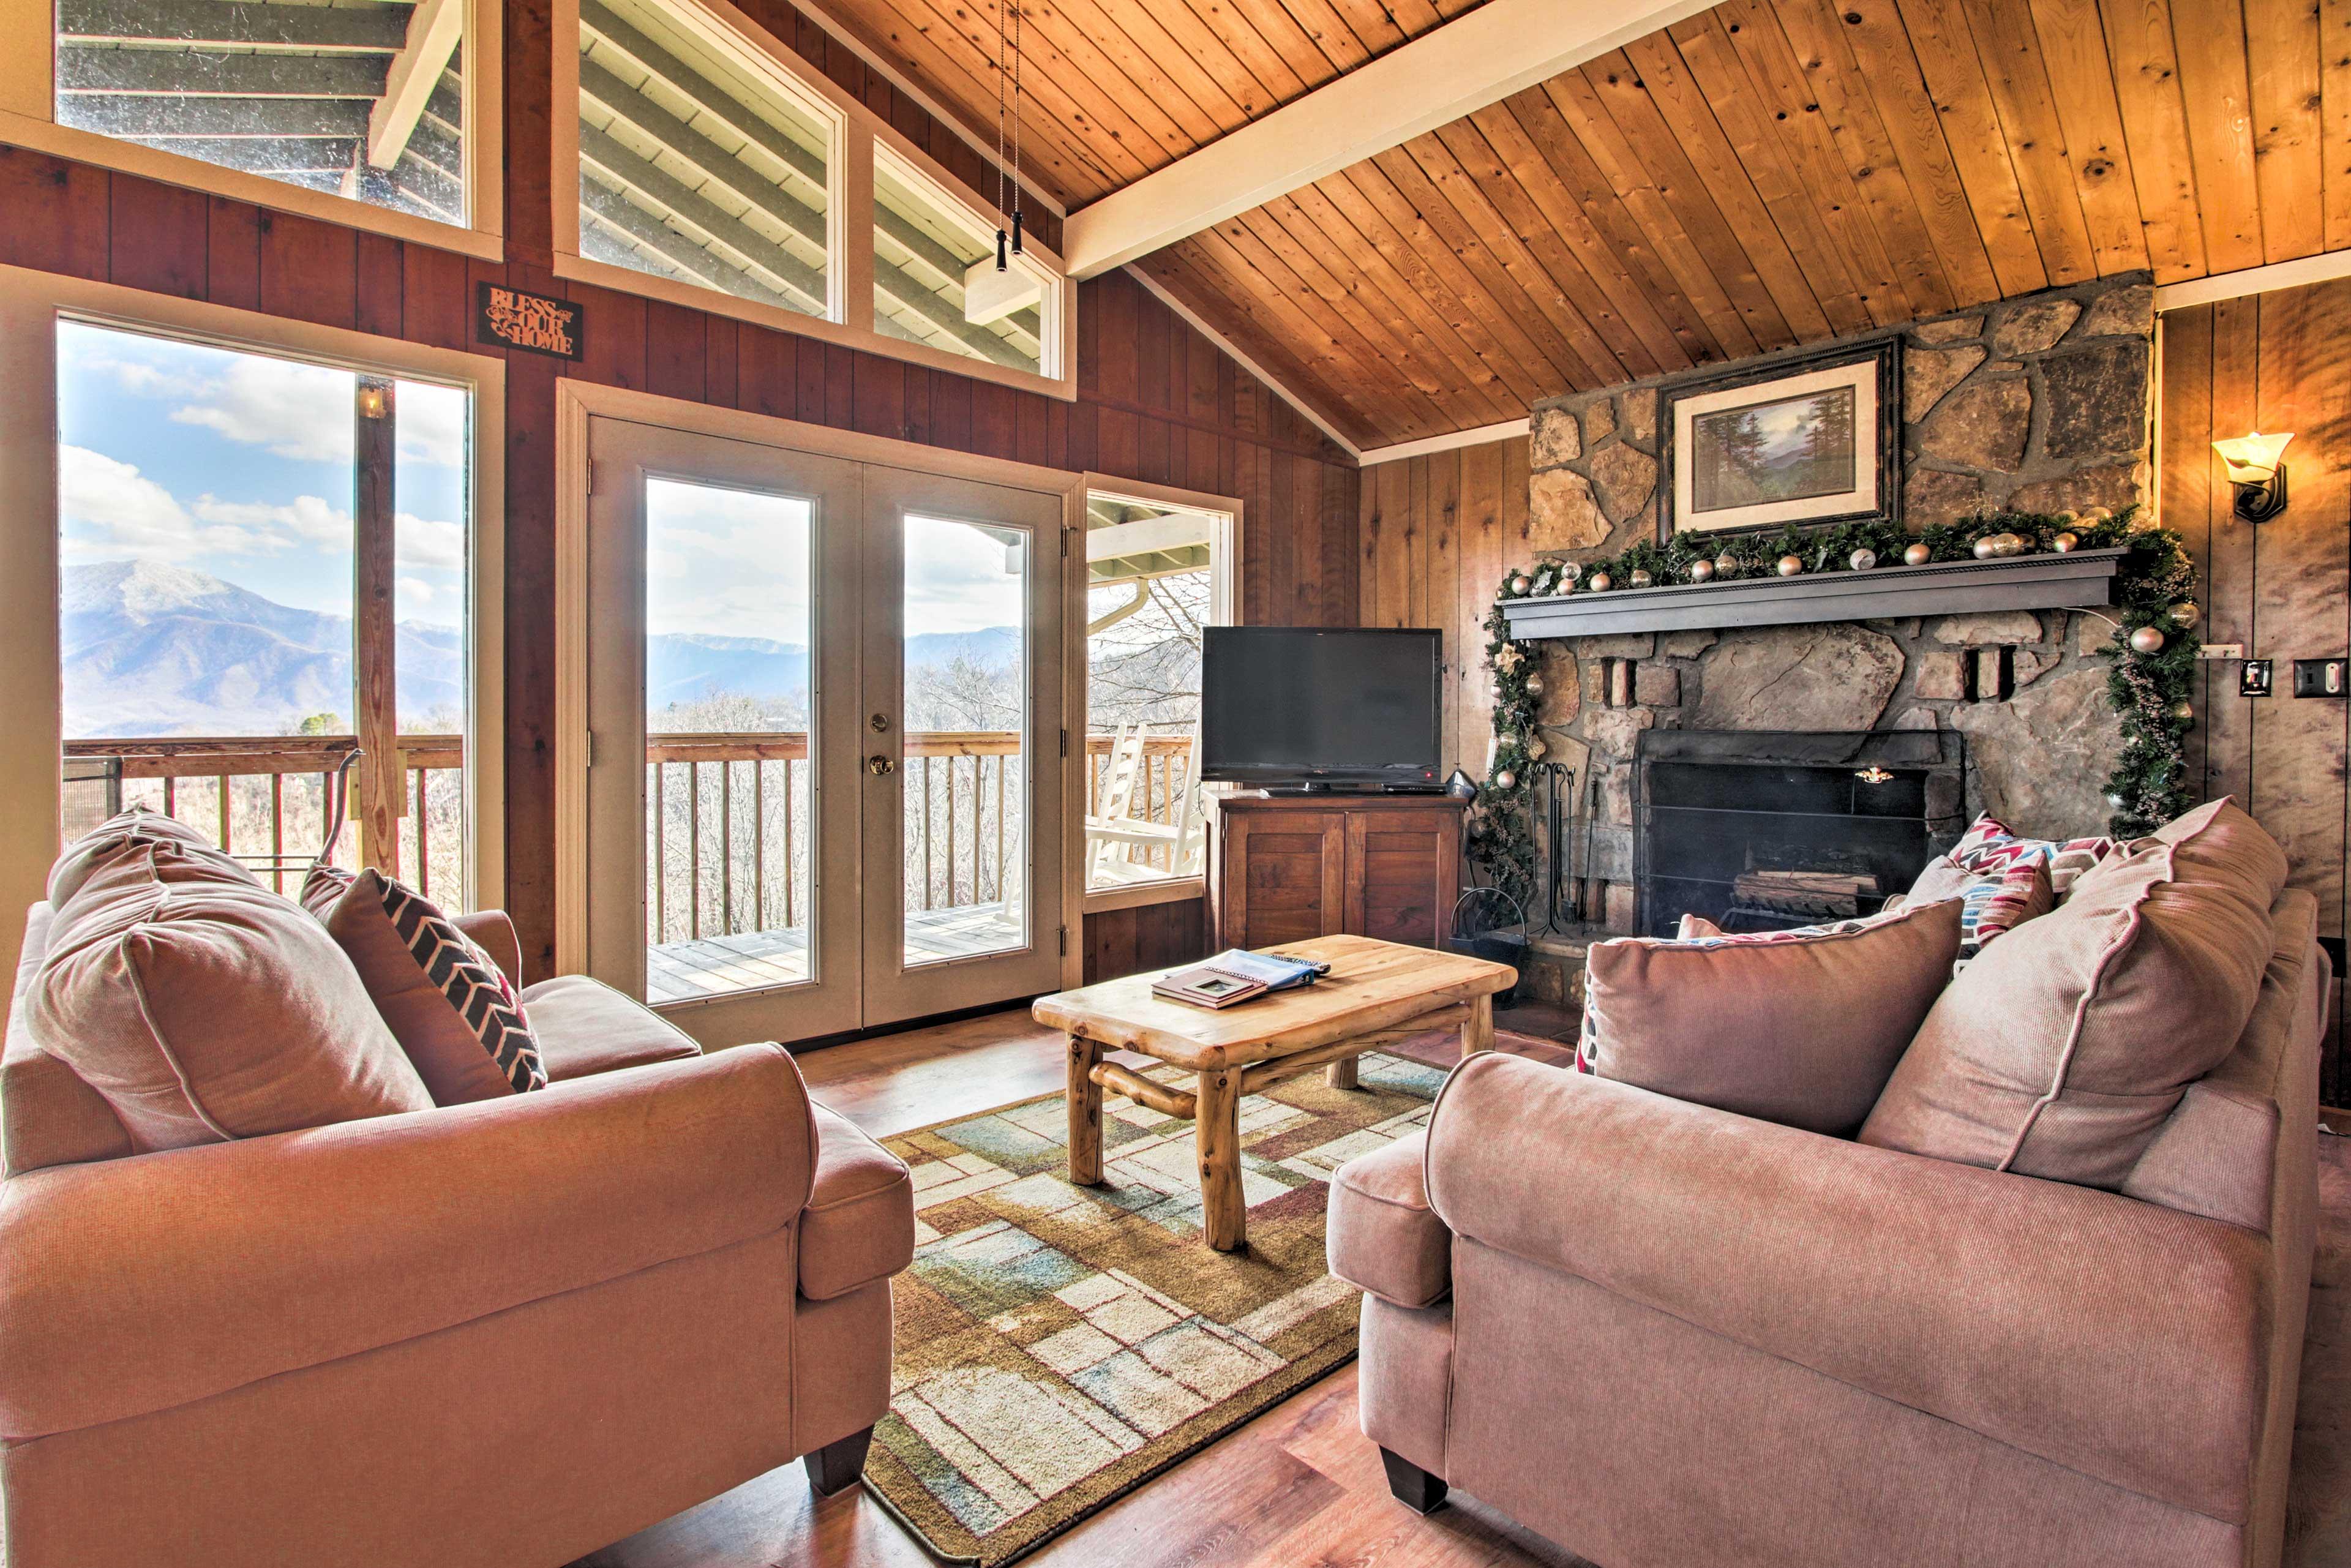 Plan a Smoky Mountain getaway to this Gatlinburg vacation rental cabin!